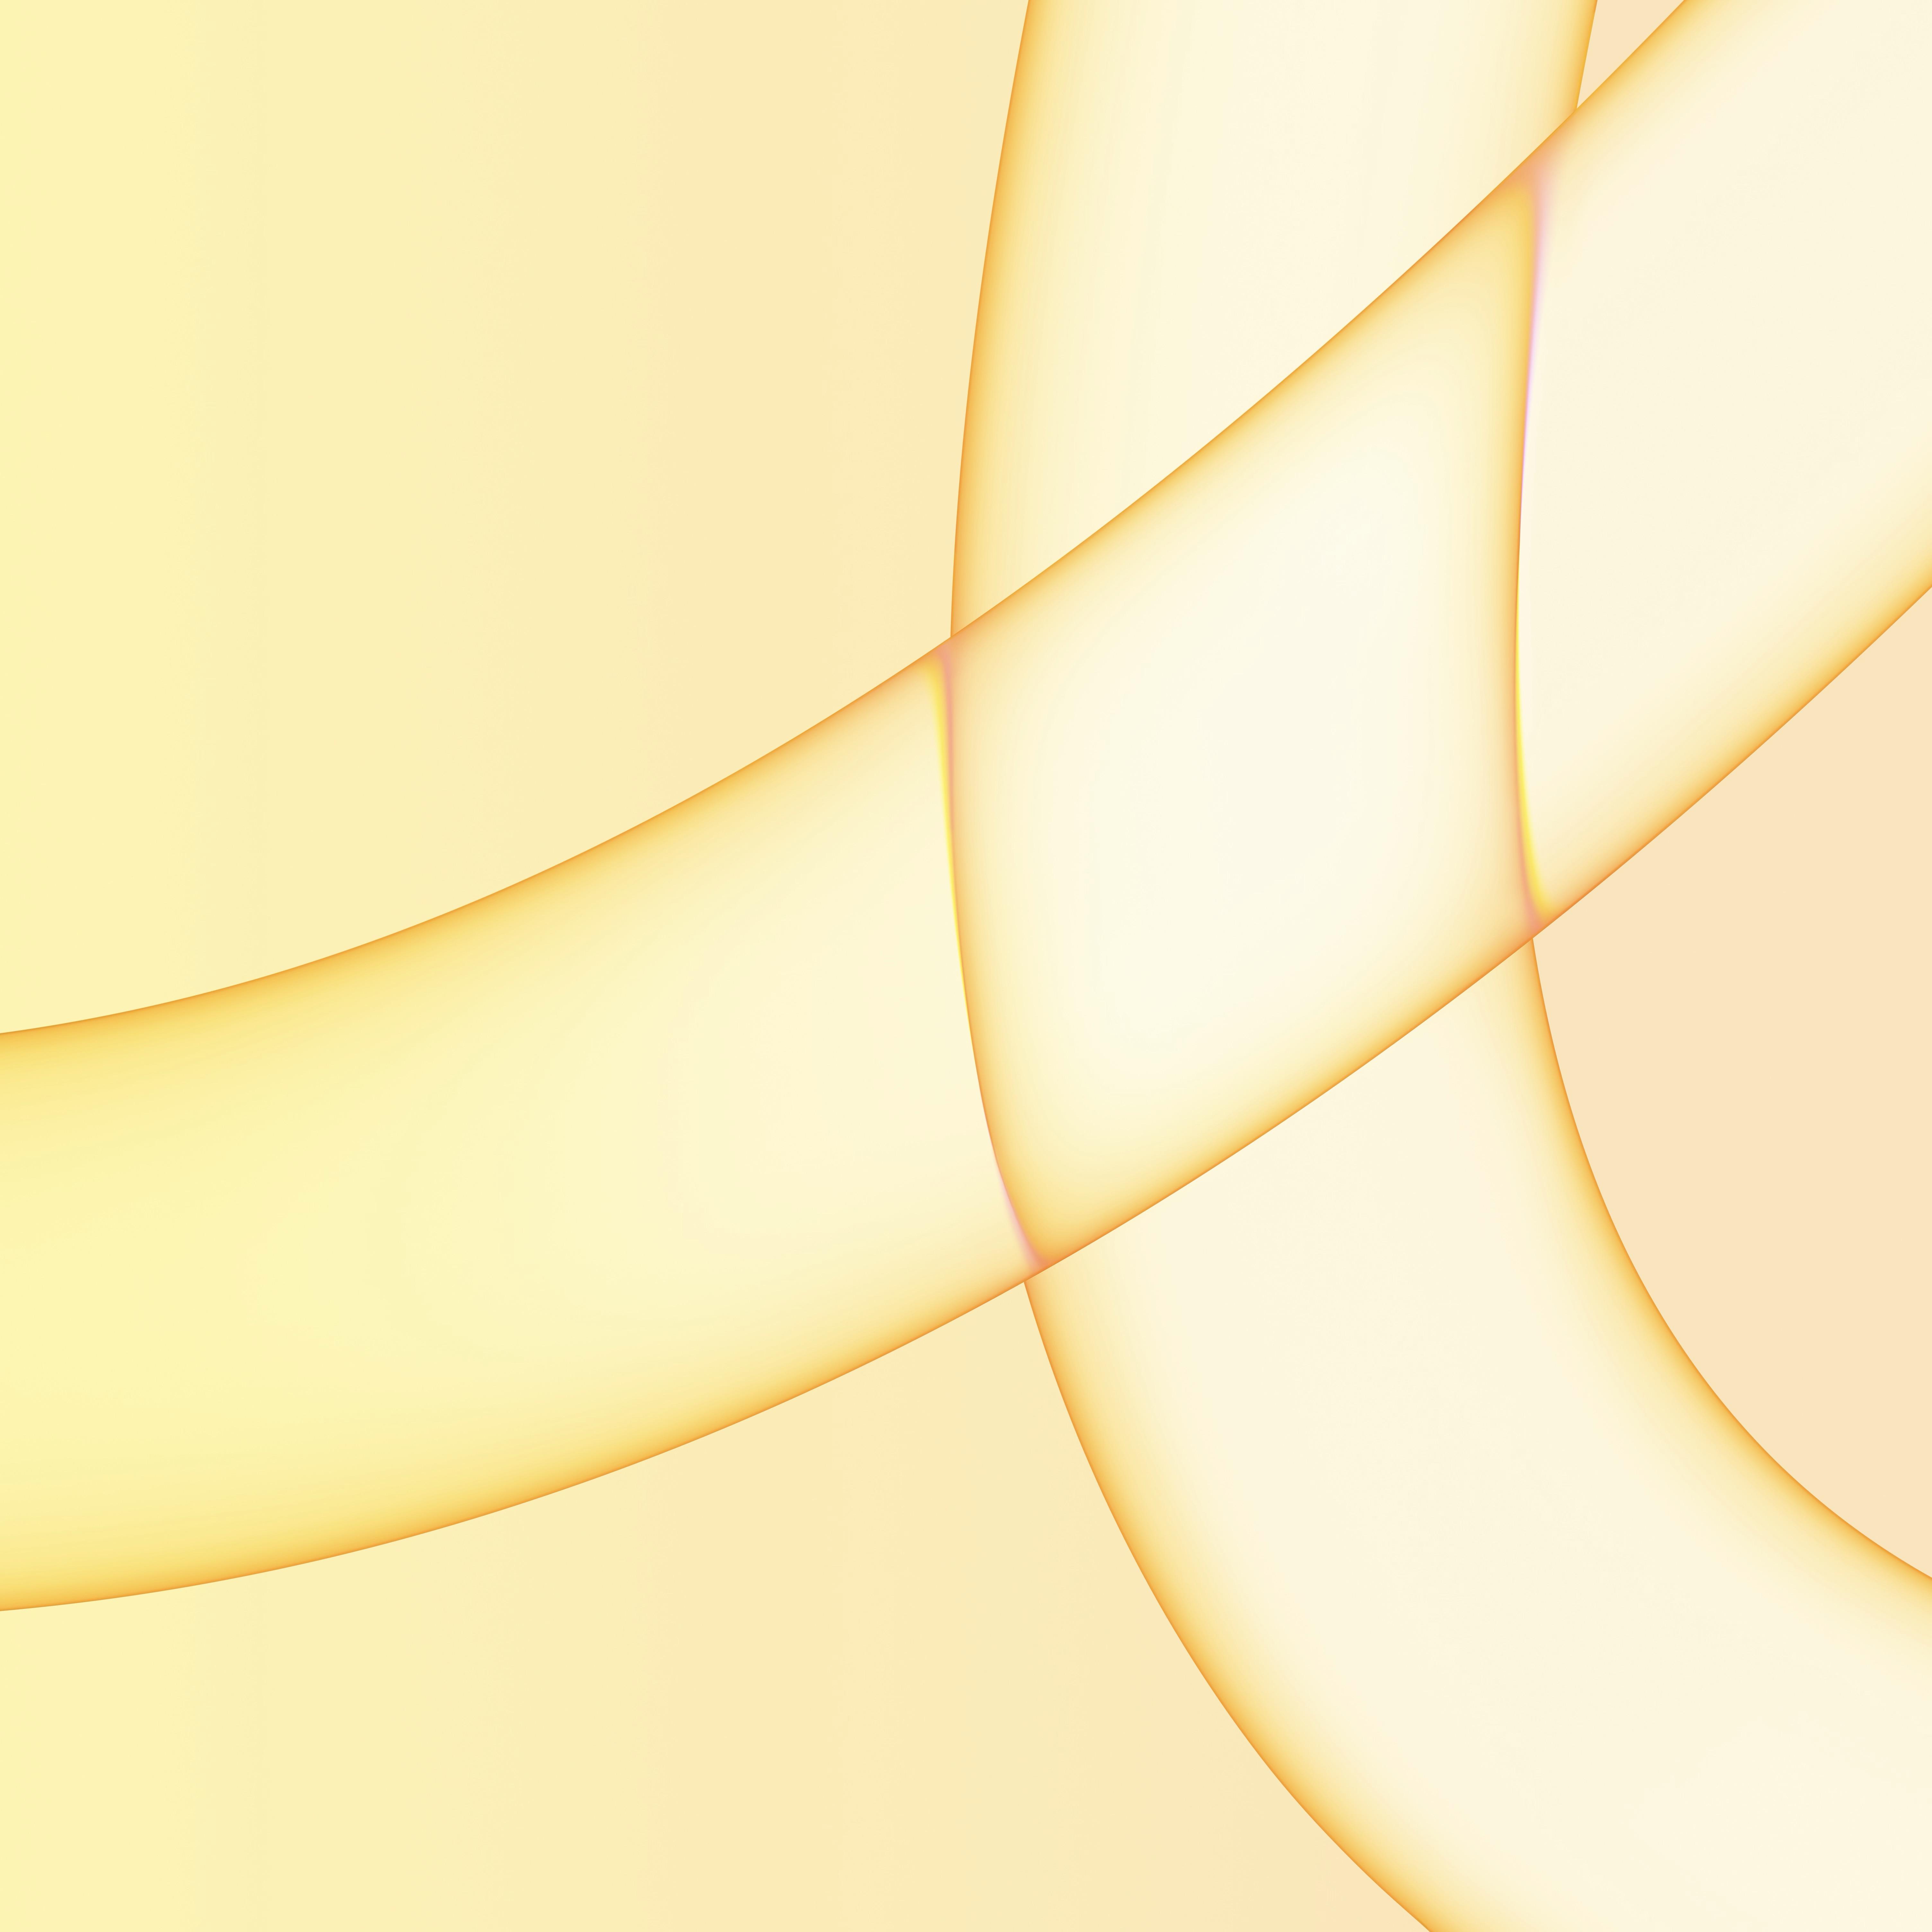 2021 iMac color matching wallpaper idownloadblog (Yellow Light) @AR72014